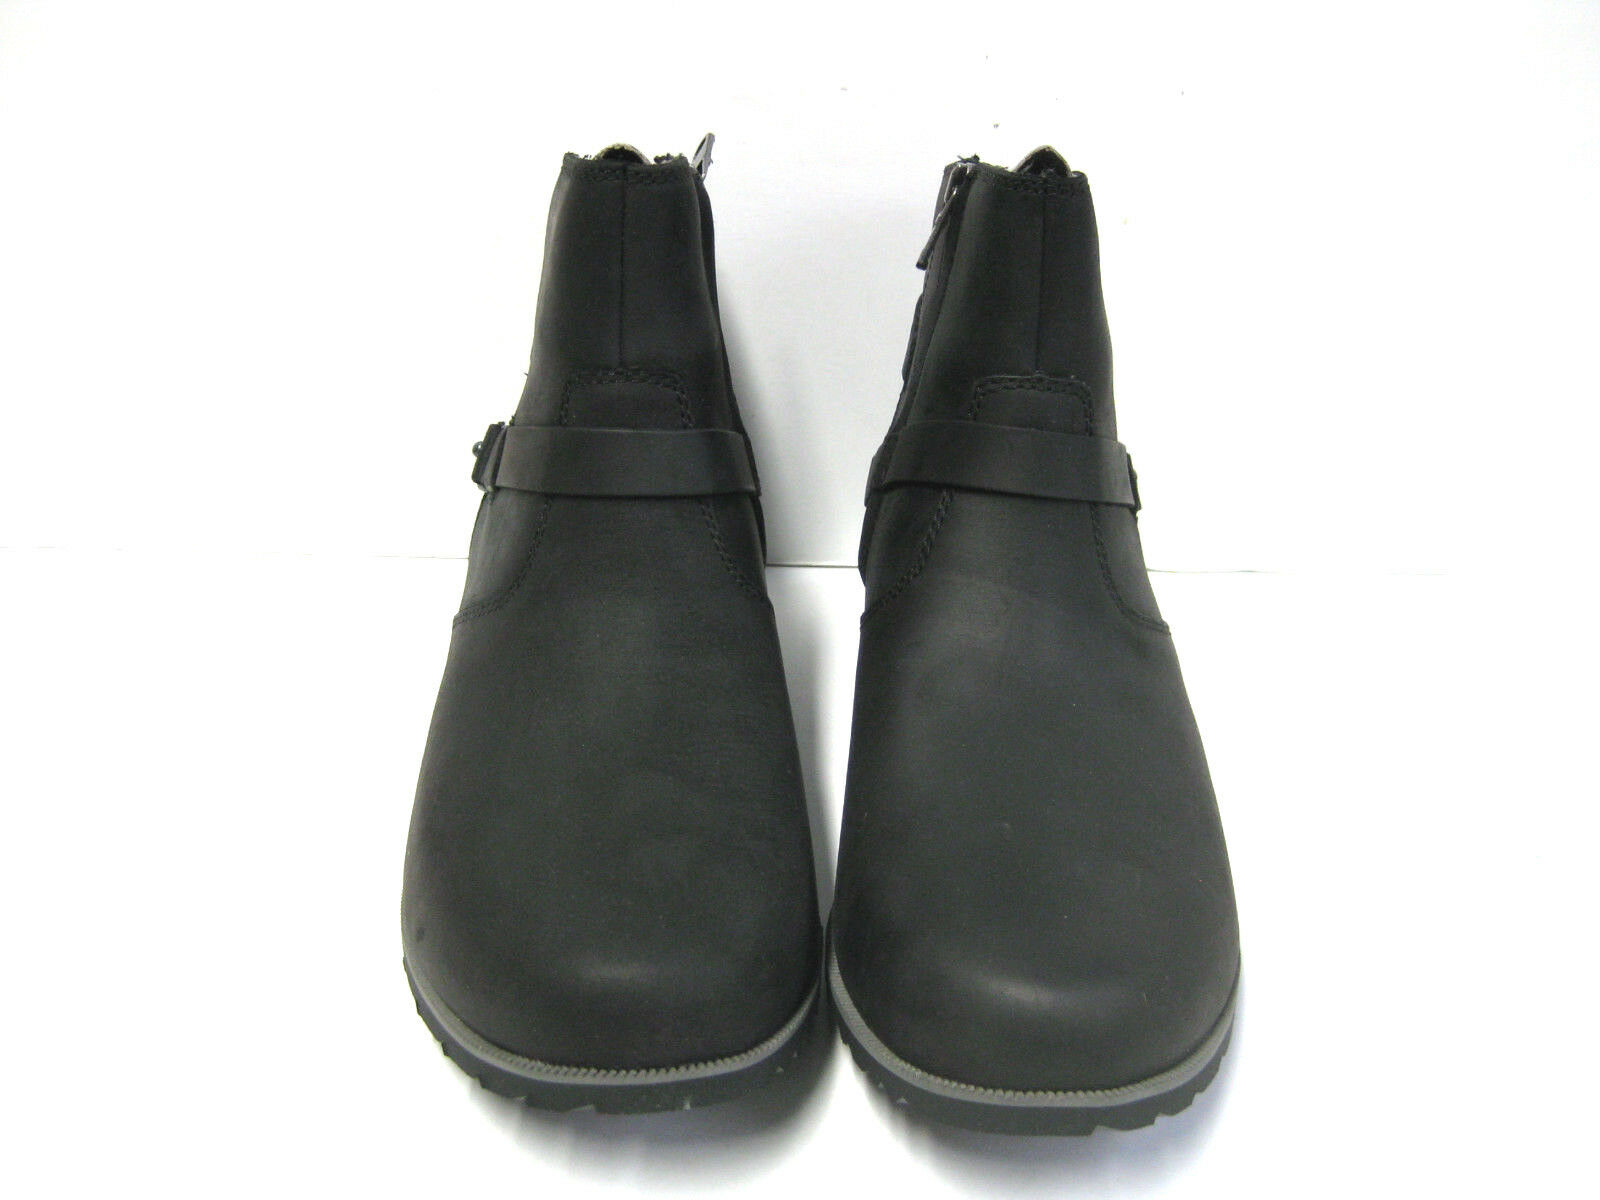 TEVA DE LA VINA VINA VINA damen ANKEL Stiefel SUEDE schwarz  US 7  UK 5  EU 38 6c04f5